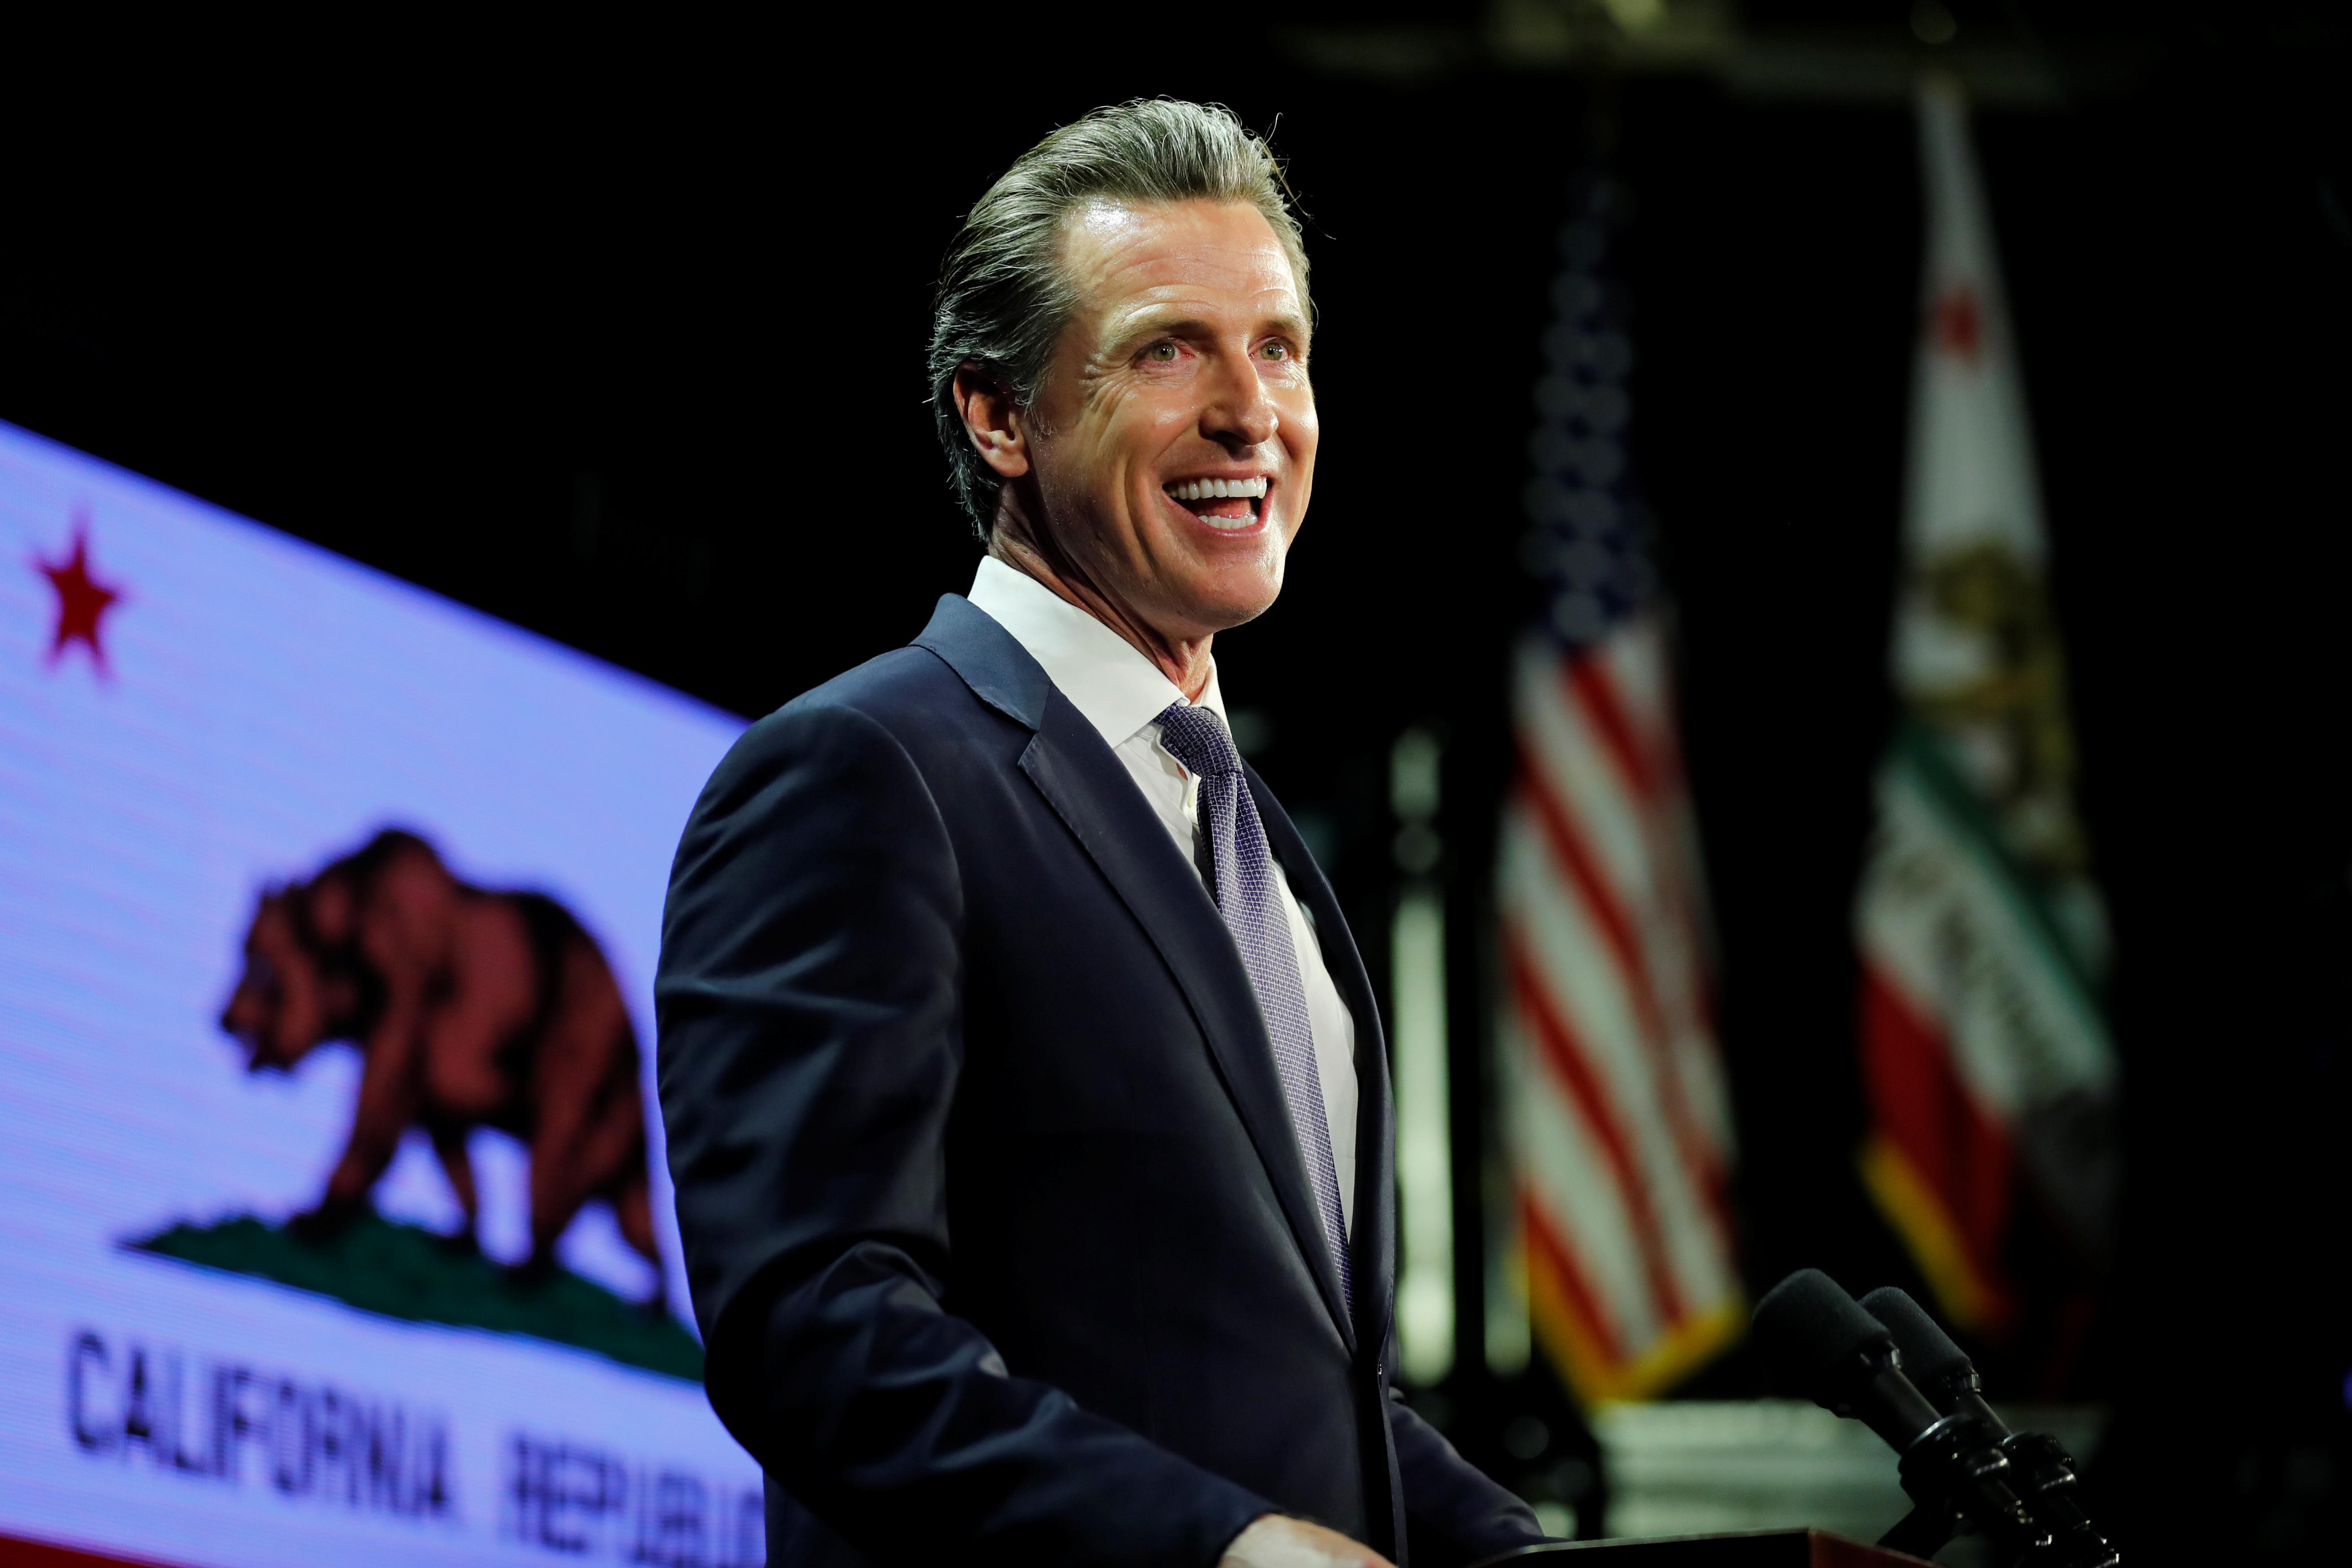 New California Governor Gavin Newsom Has Bold Plans For Families